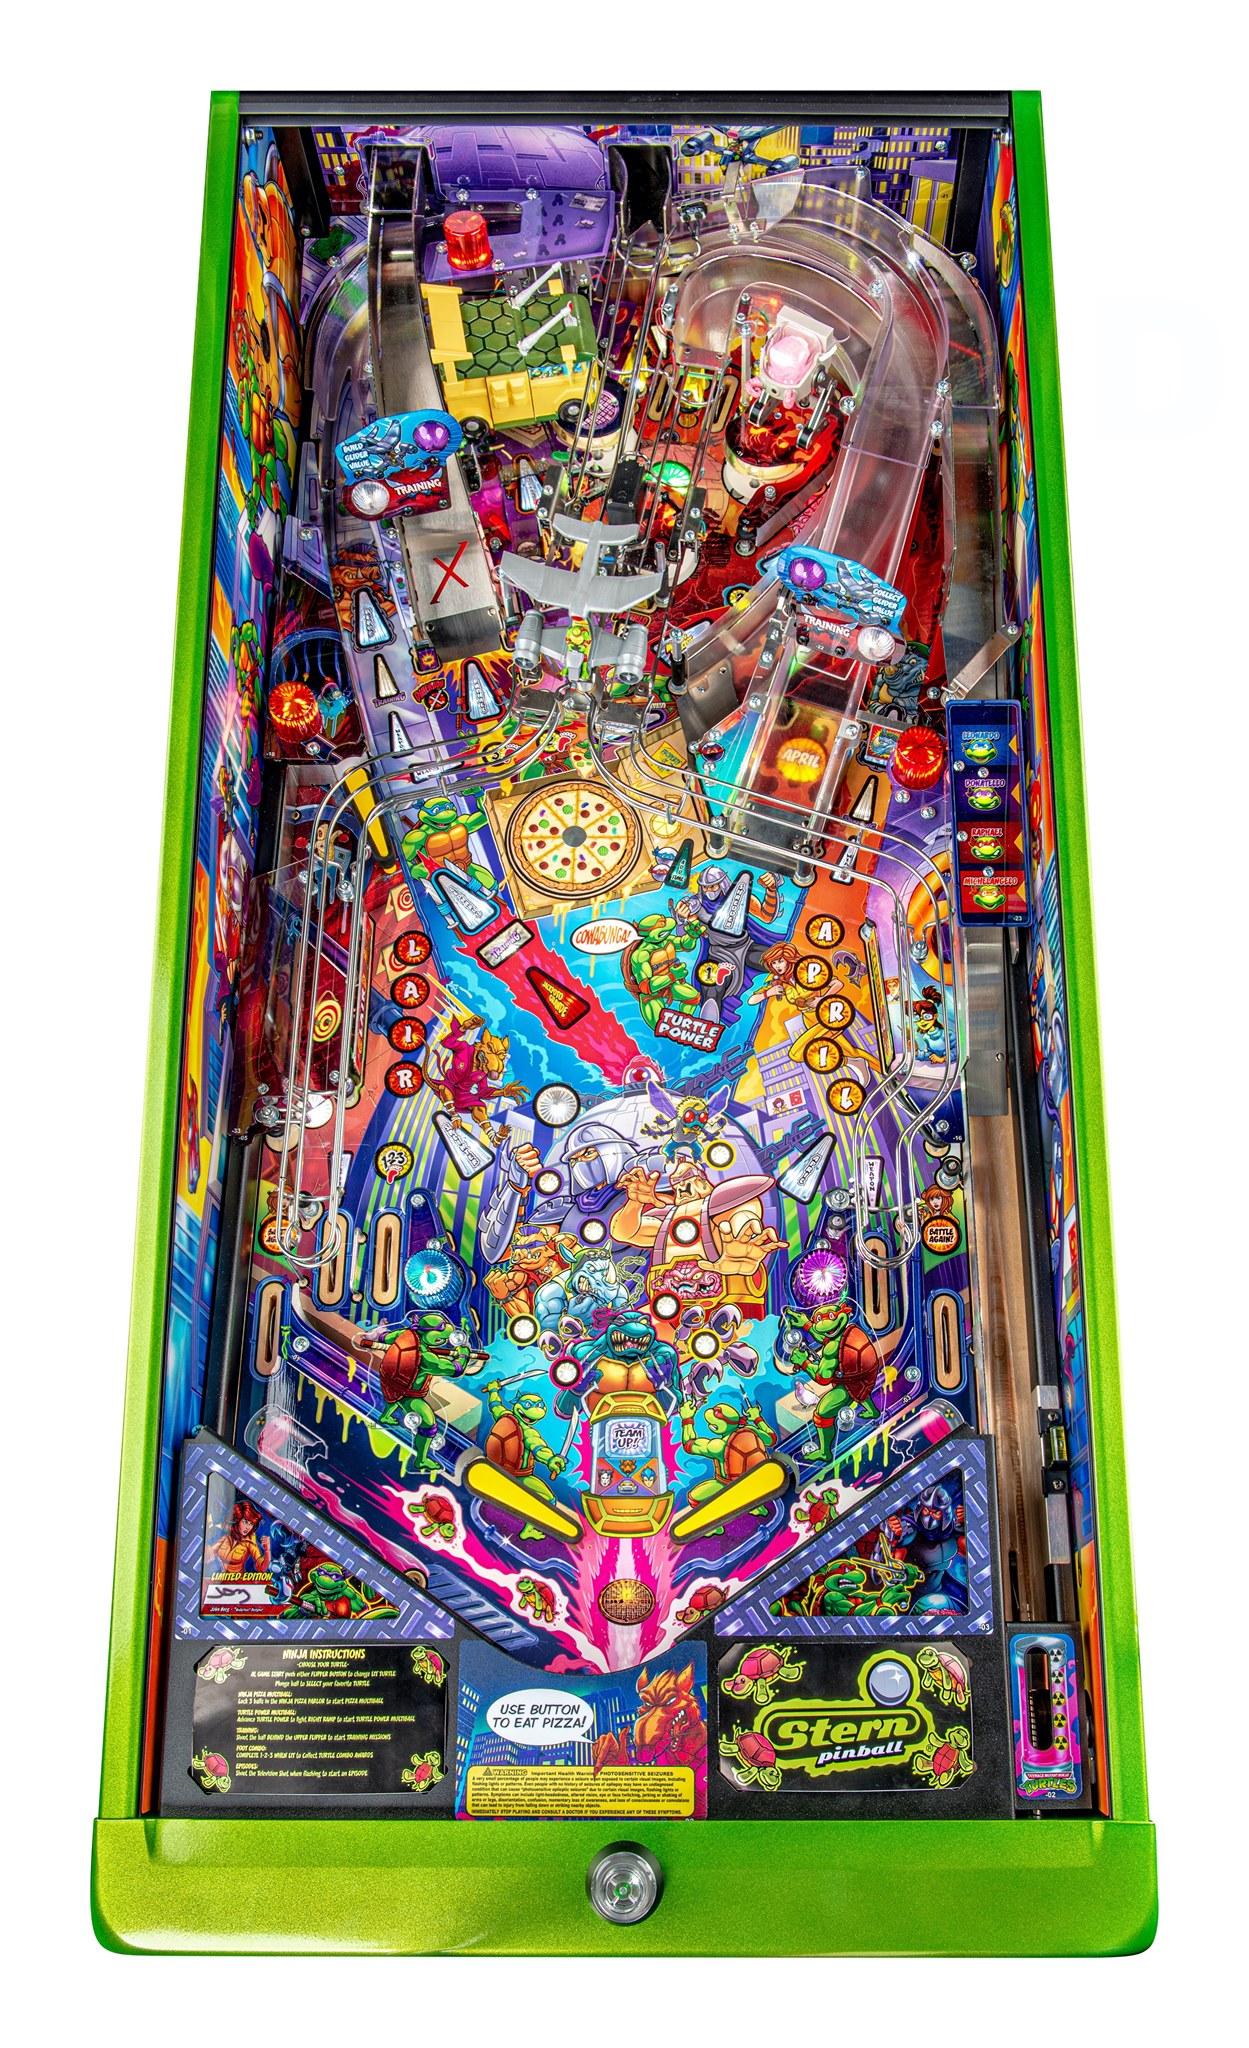 TMNT Pinball LE Playfield